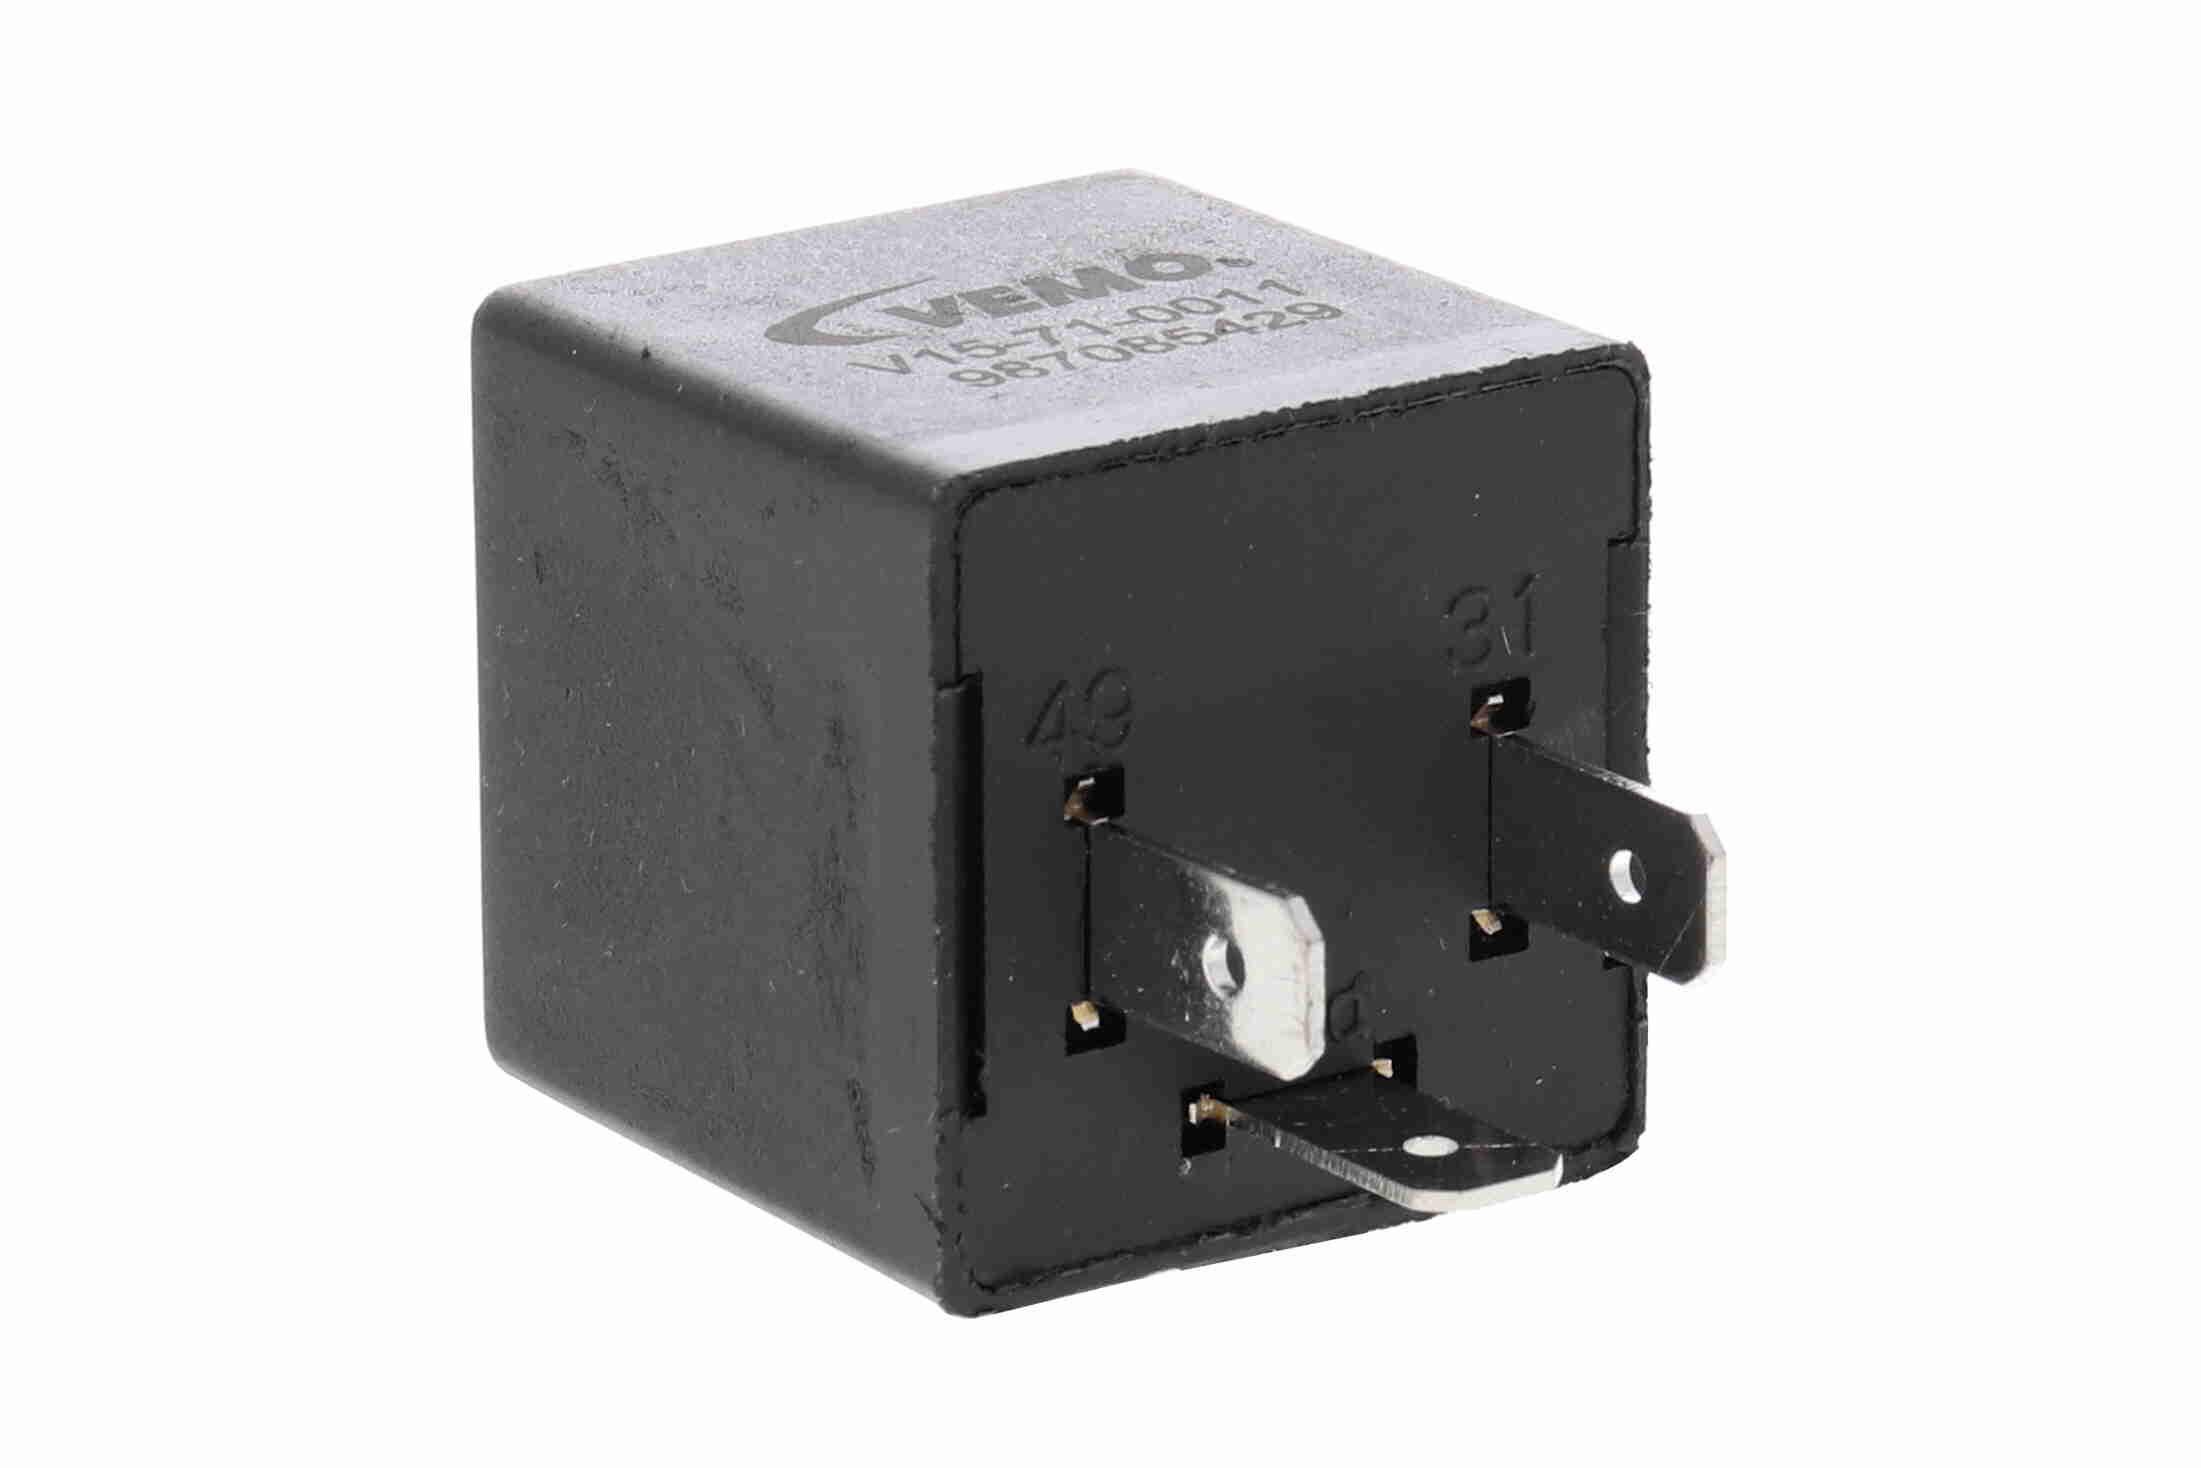 Flasher Unit VEMO V15-71-0011 Reviews